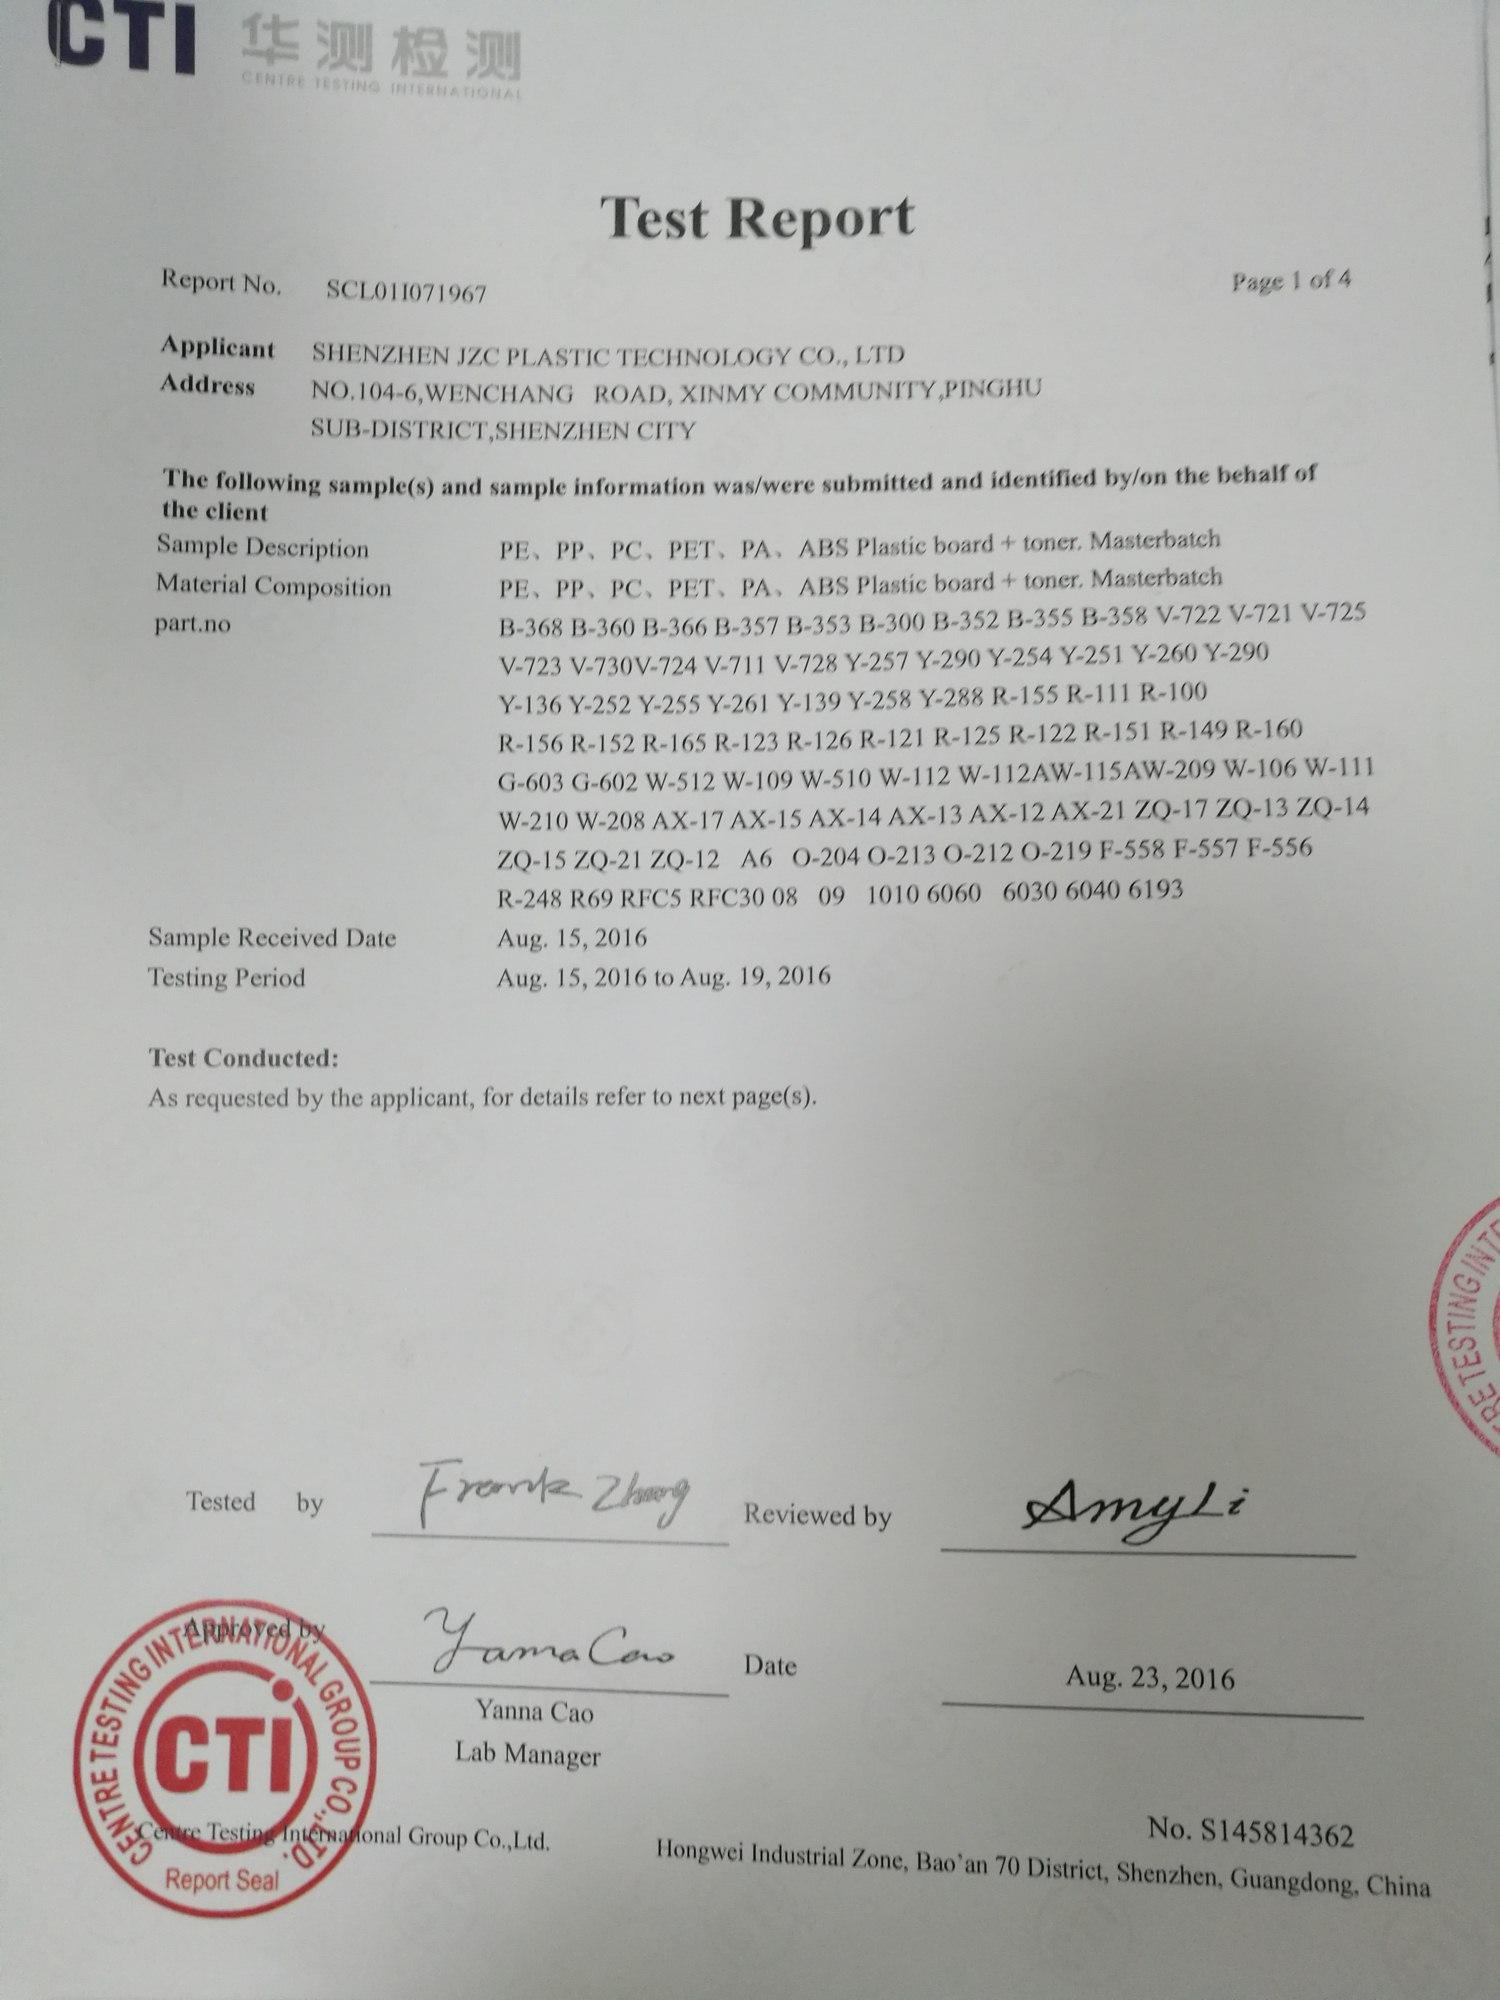 Phthalates Certificate of Masterbatch